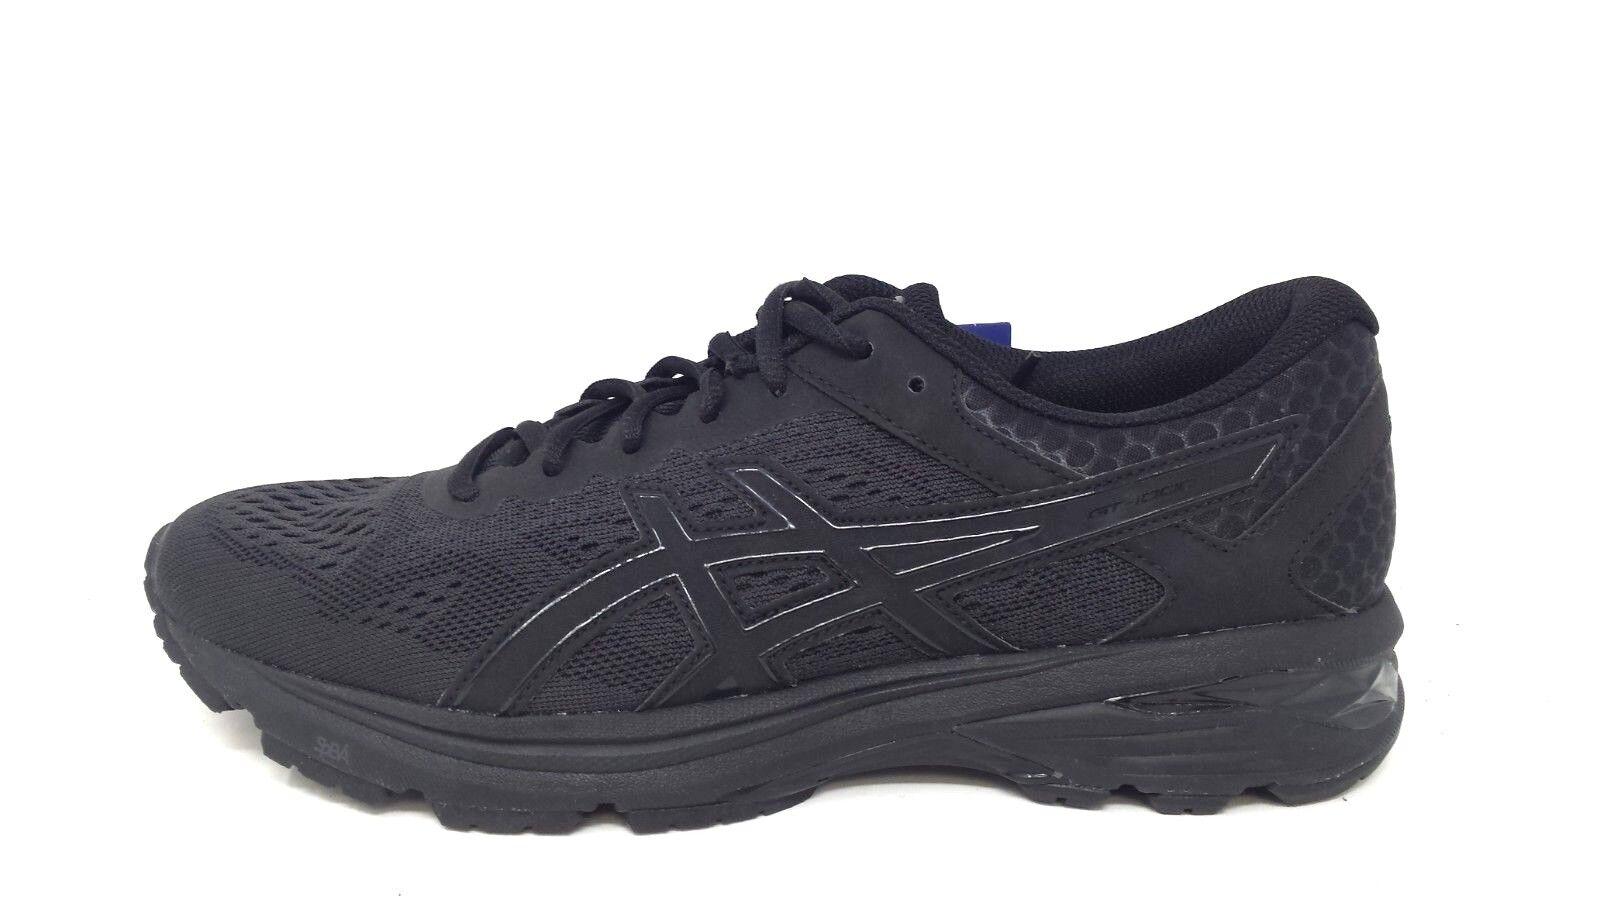 New  ASICS Men's GT-1000 6 Running shoes T7A4N Black 88R sm